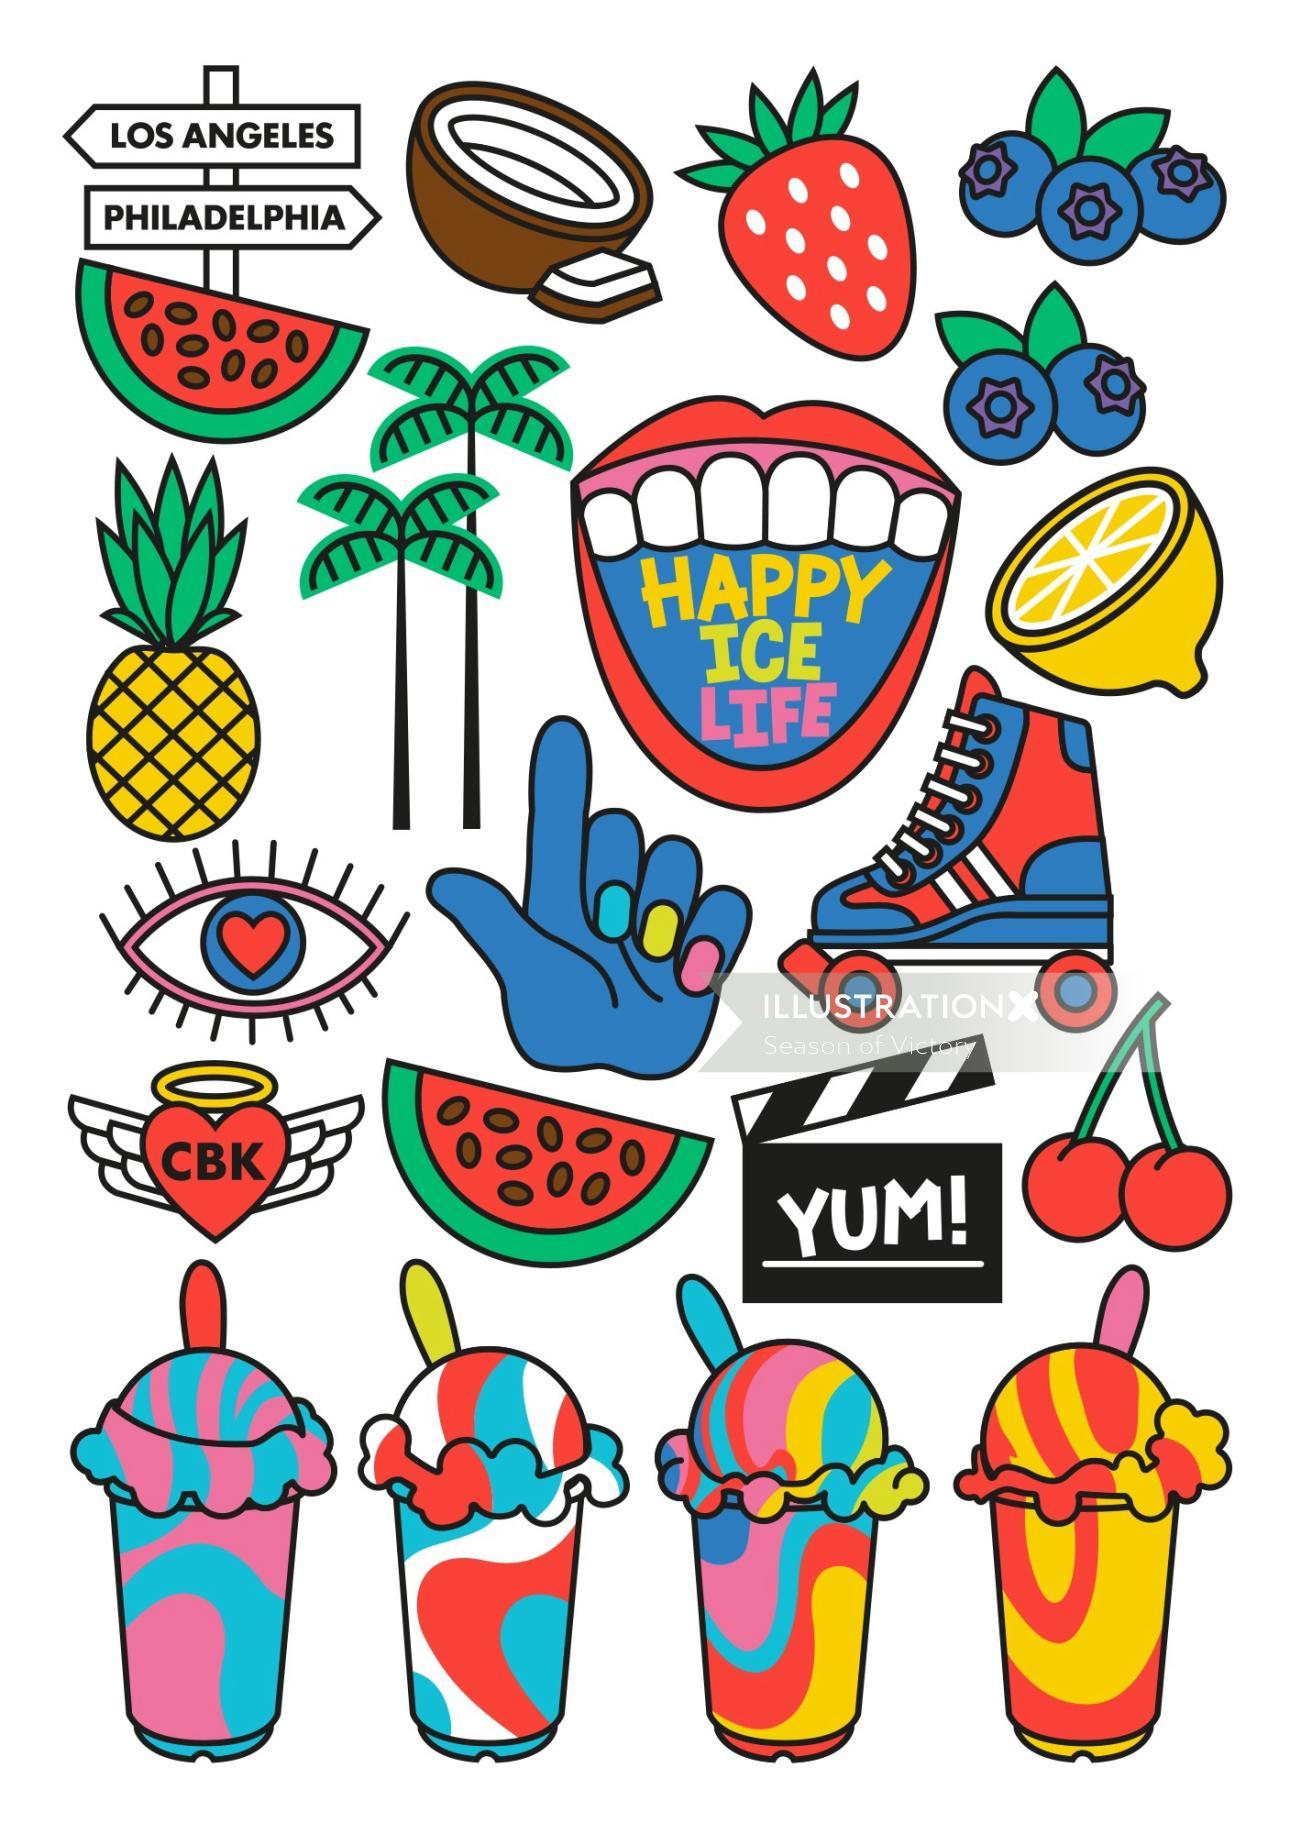 food truck, mural, branding. Ice cream, fruit, dairy free, fat free, vegan, stickers, icons, symbols